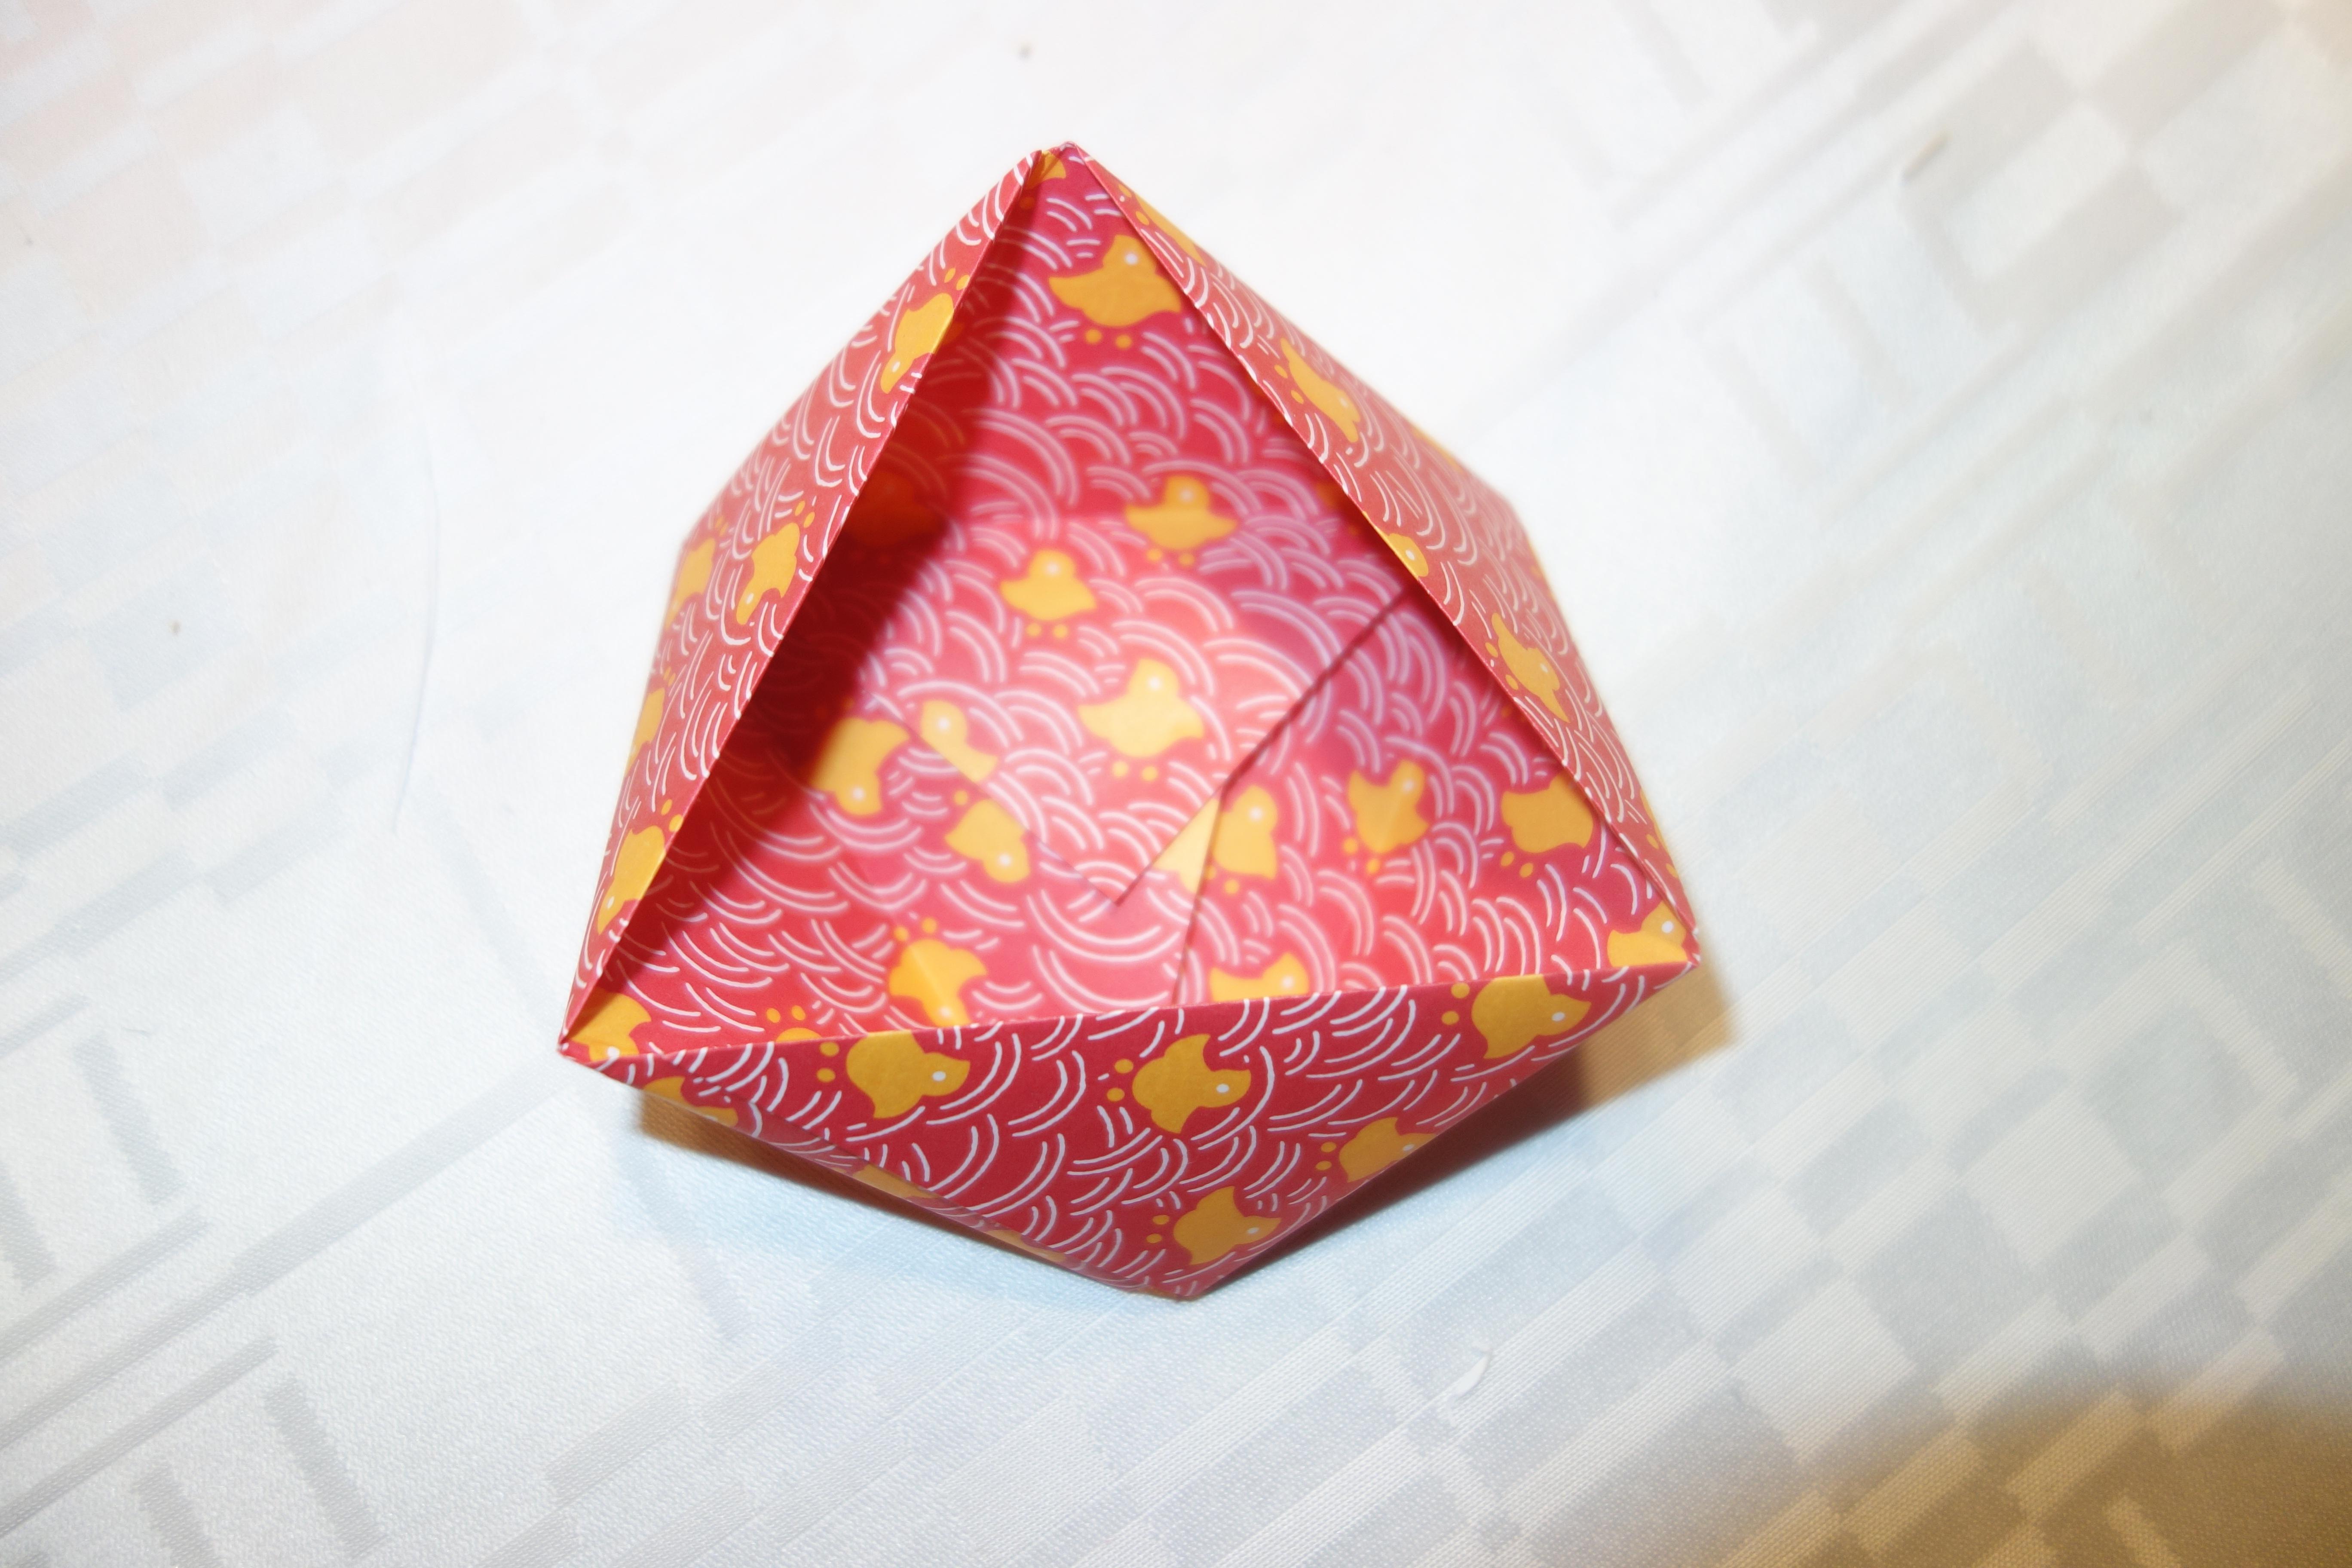 Origami kraftykorte page 2 dsc04700 dsc04701 dsc04703 floridaeventfo Images